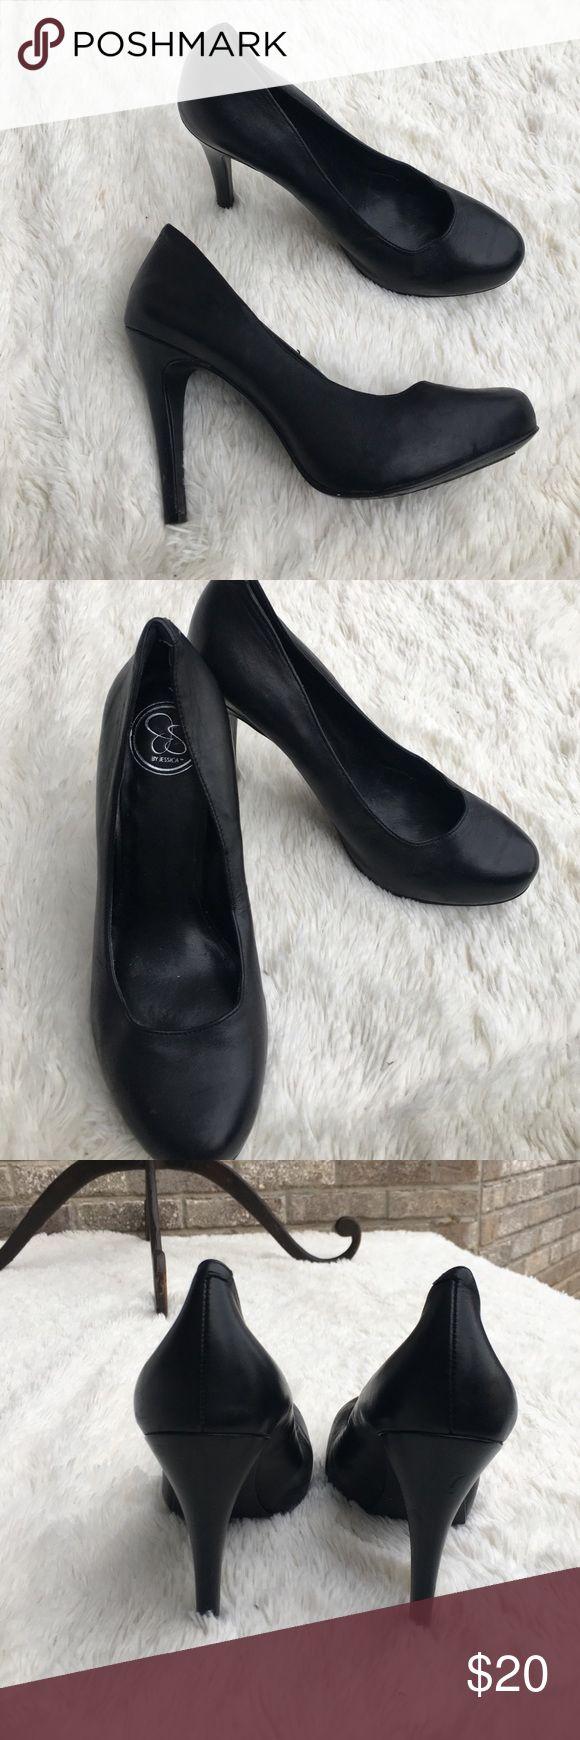 Jessica Simpson Black Pumps Size 6 Jessica Simpson Black Pumps Size 6. Worn maybe twice. Excellent condition. Jessica Simpson Shoes Heels